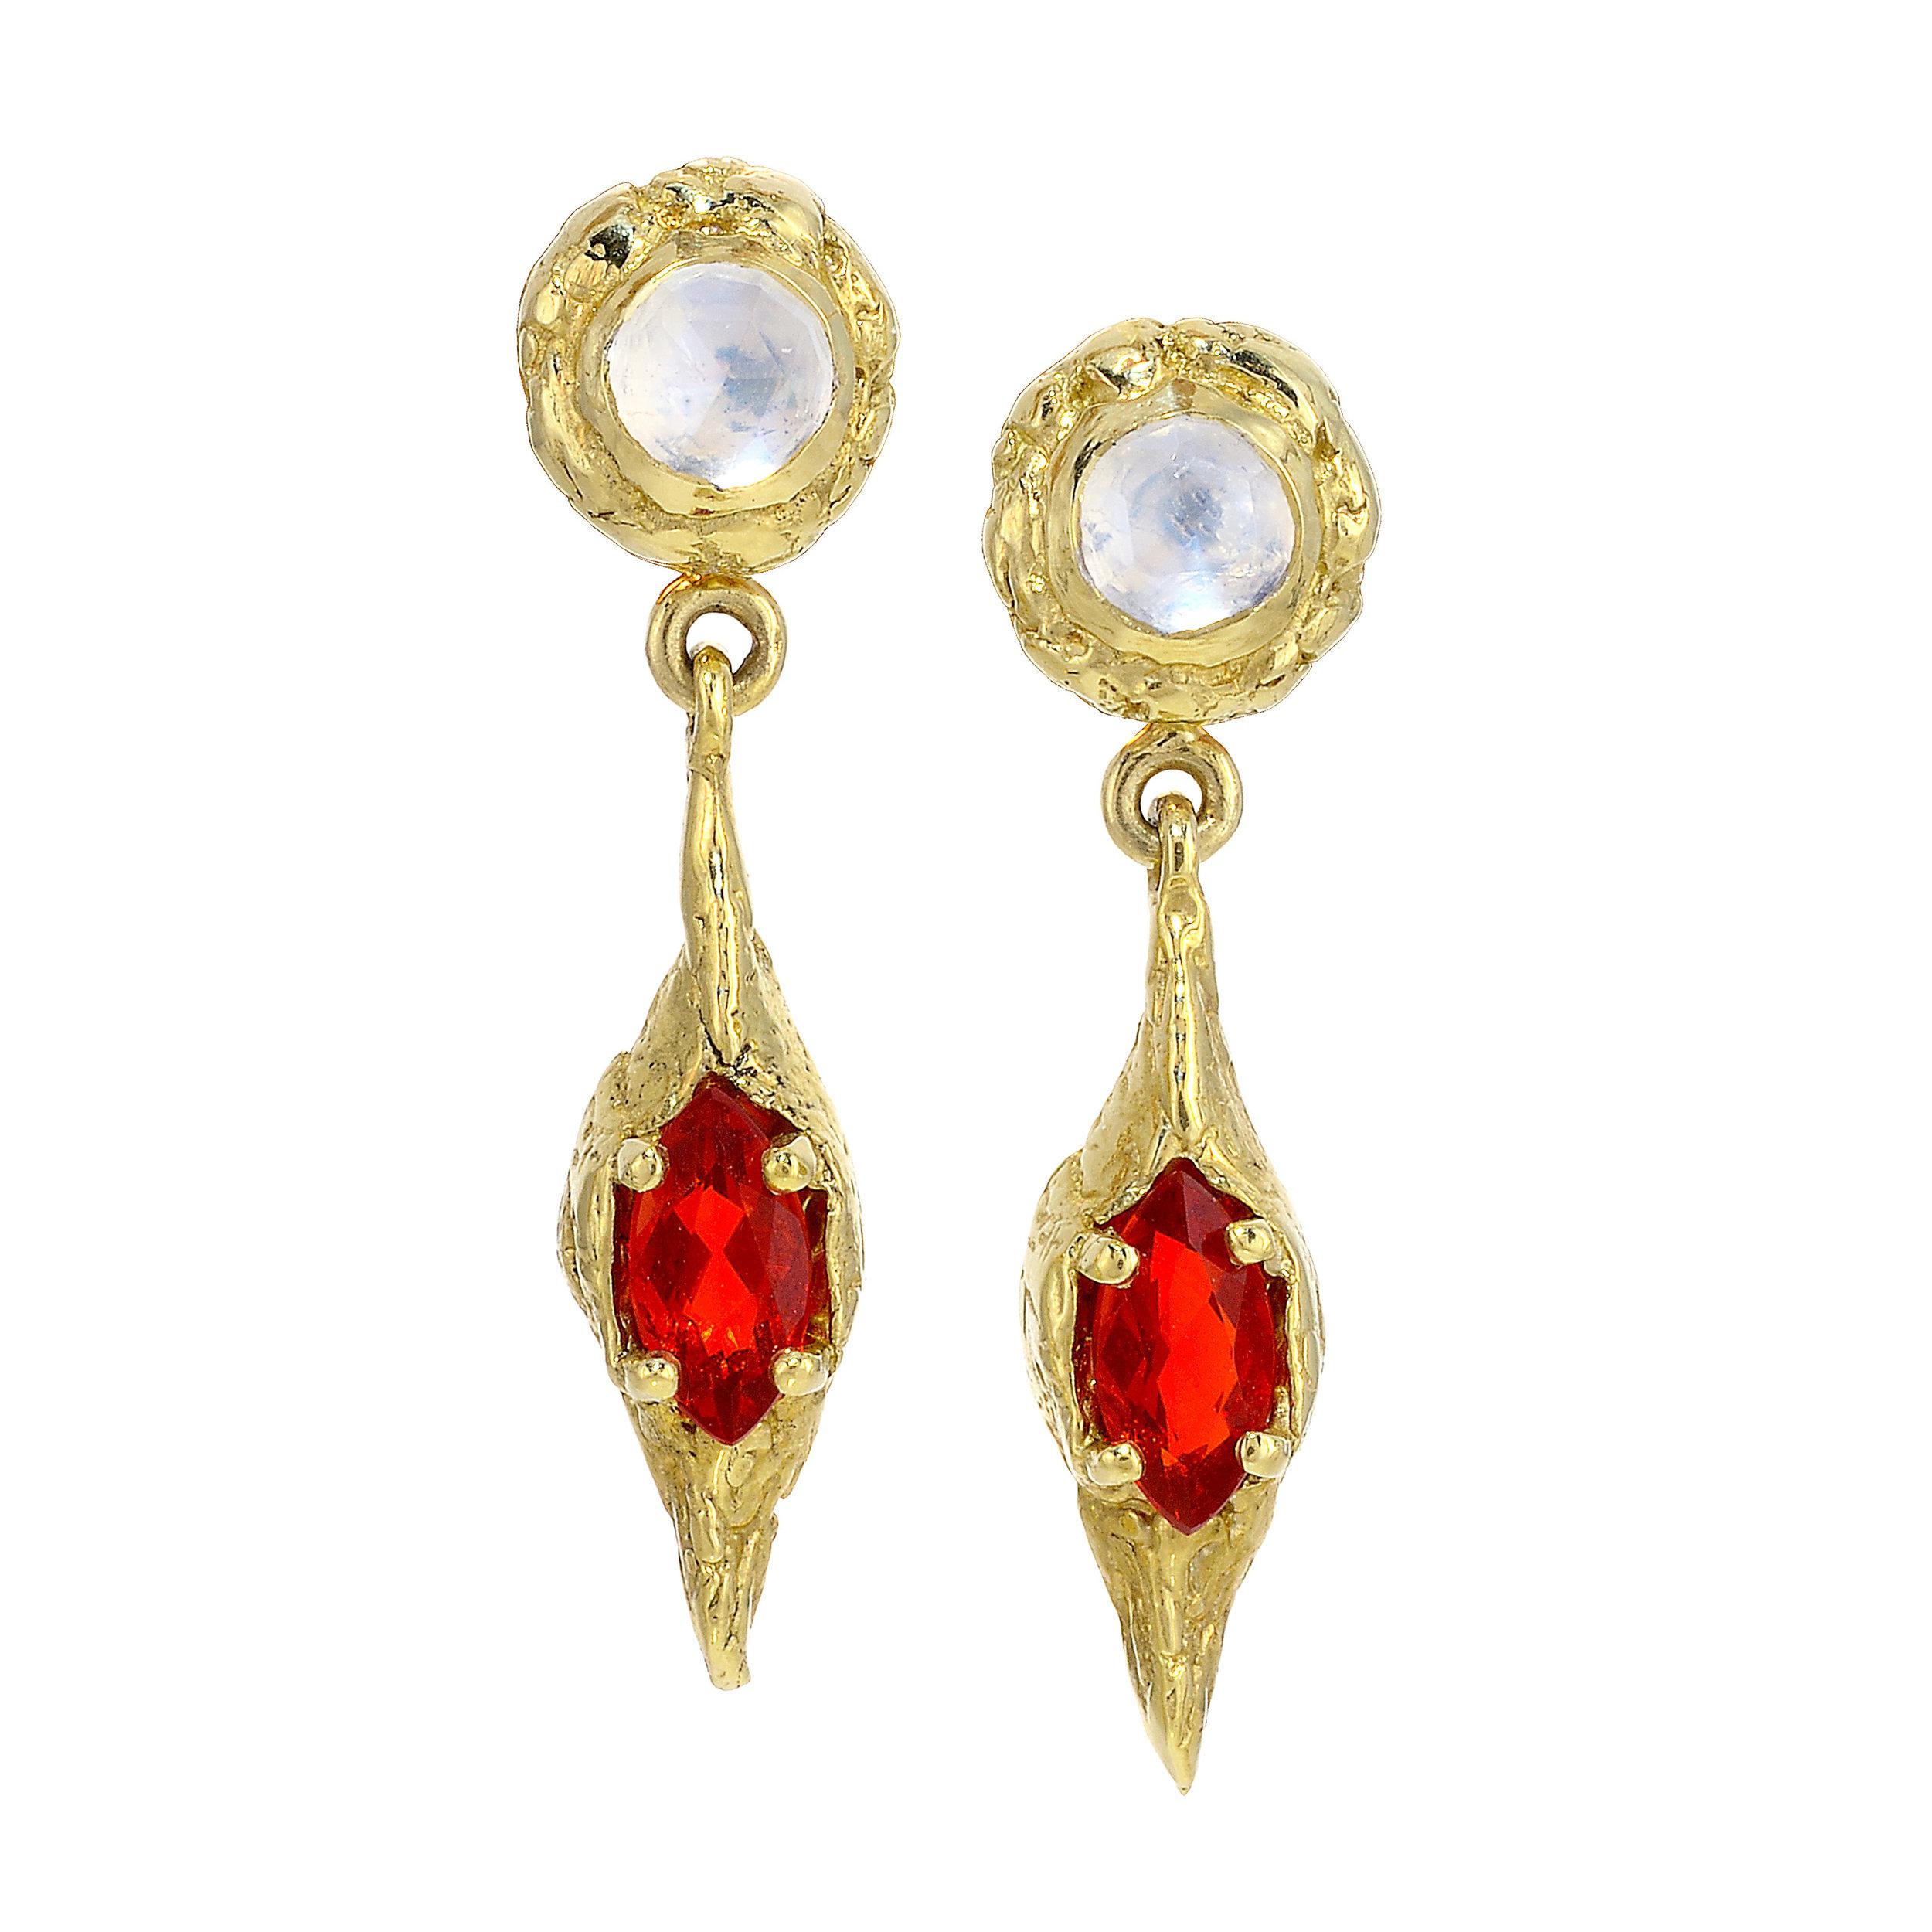 Fire Opal and Moonstone Earrings.jpg